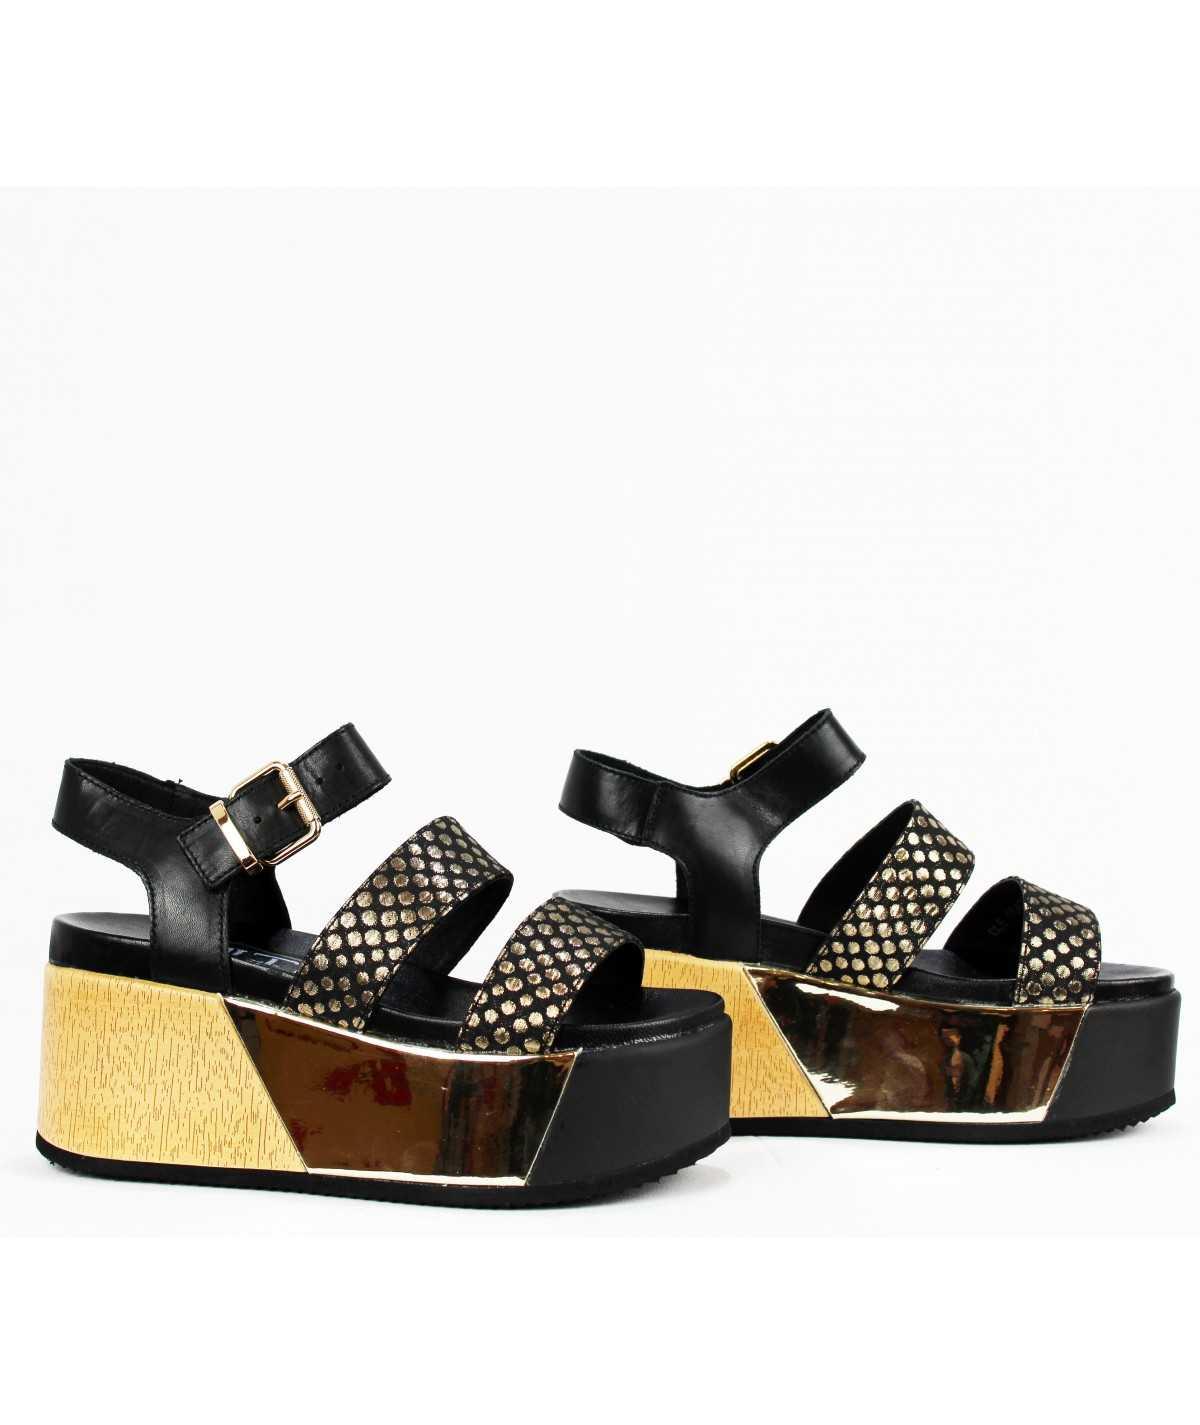 CULT Sandalo